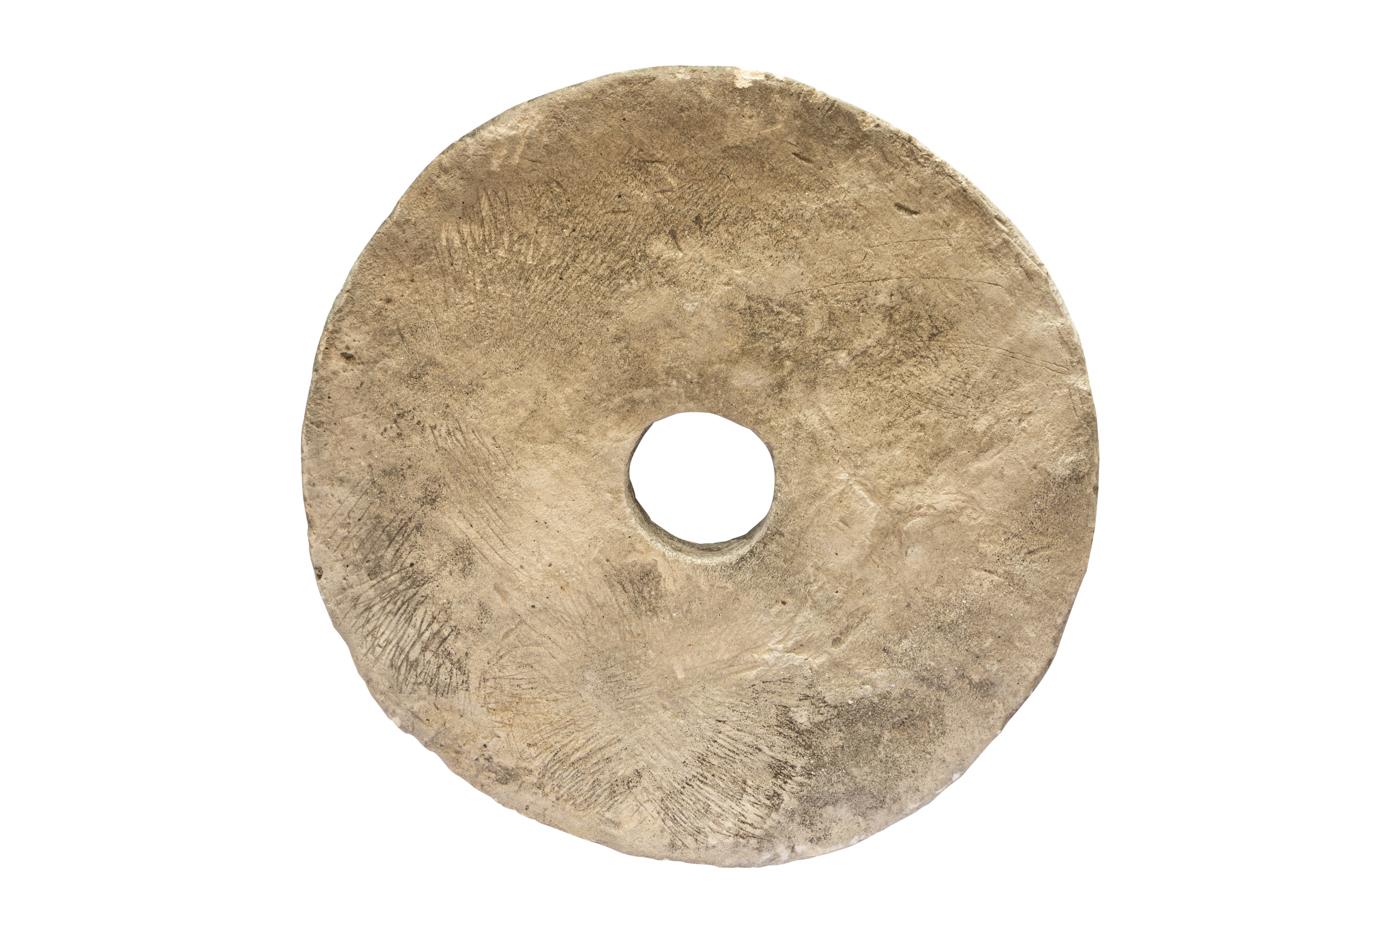 Millstone-110 Cm diameter